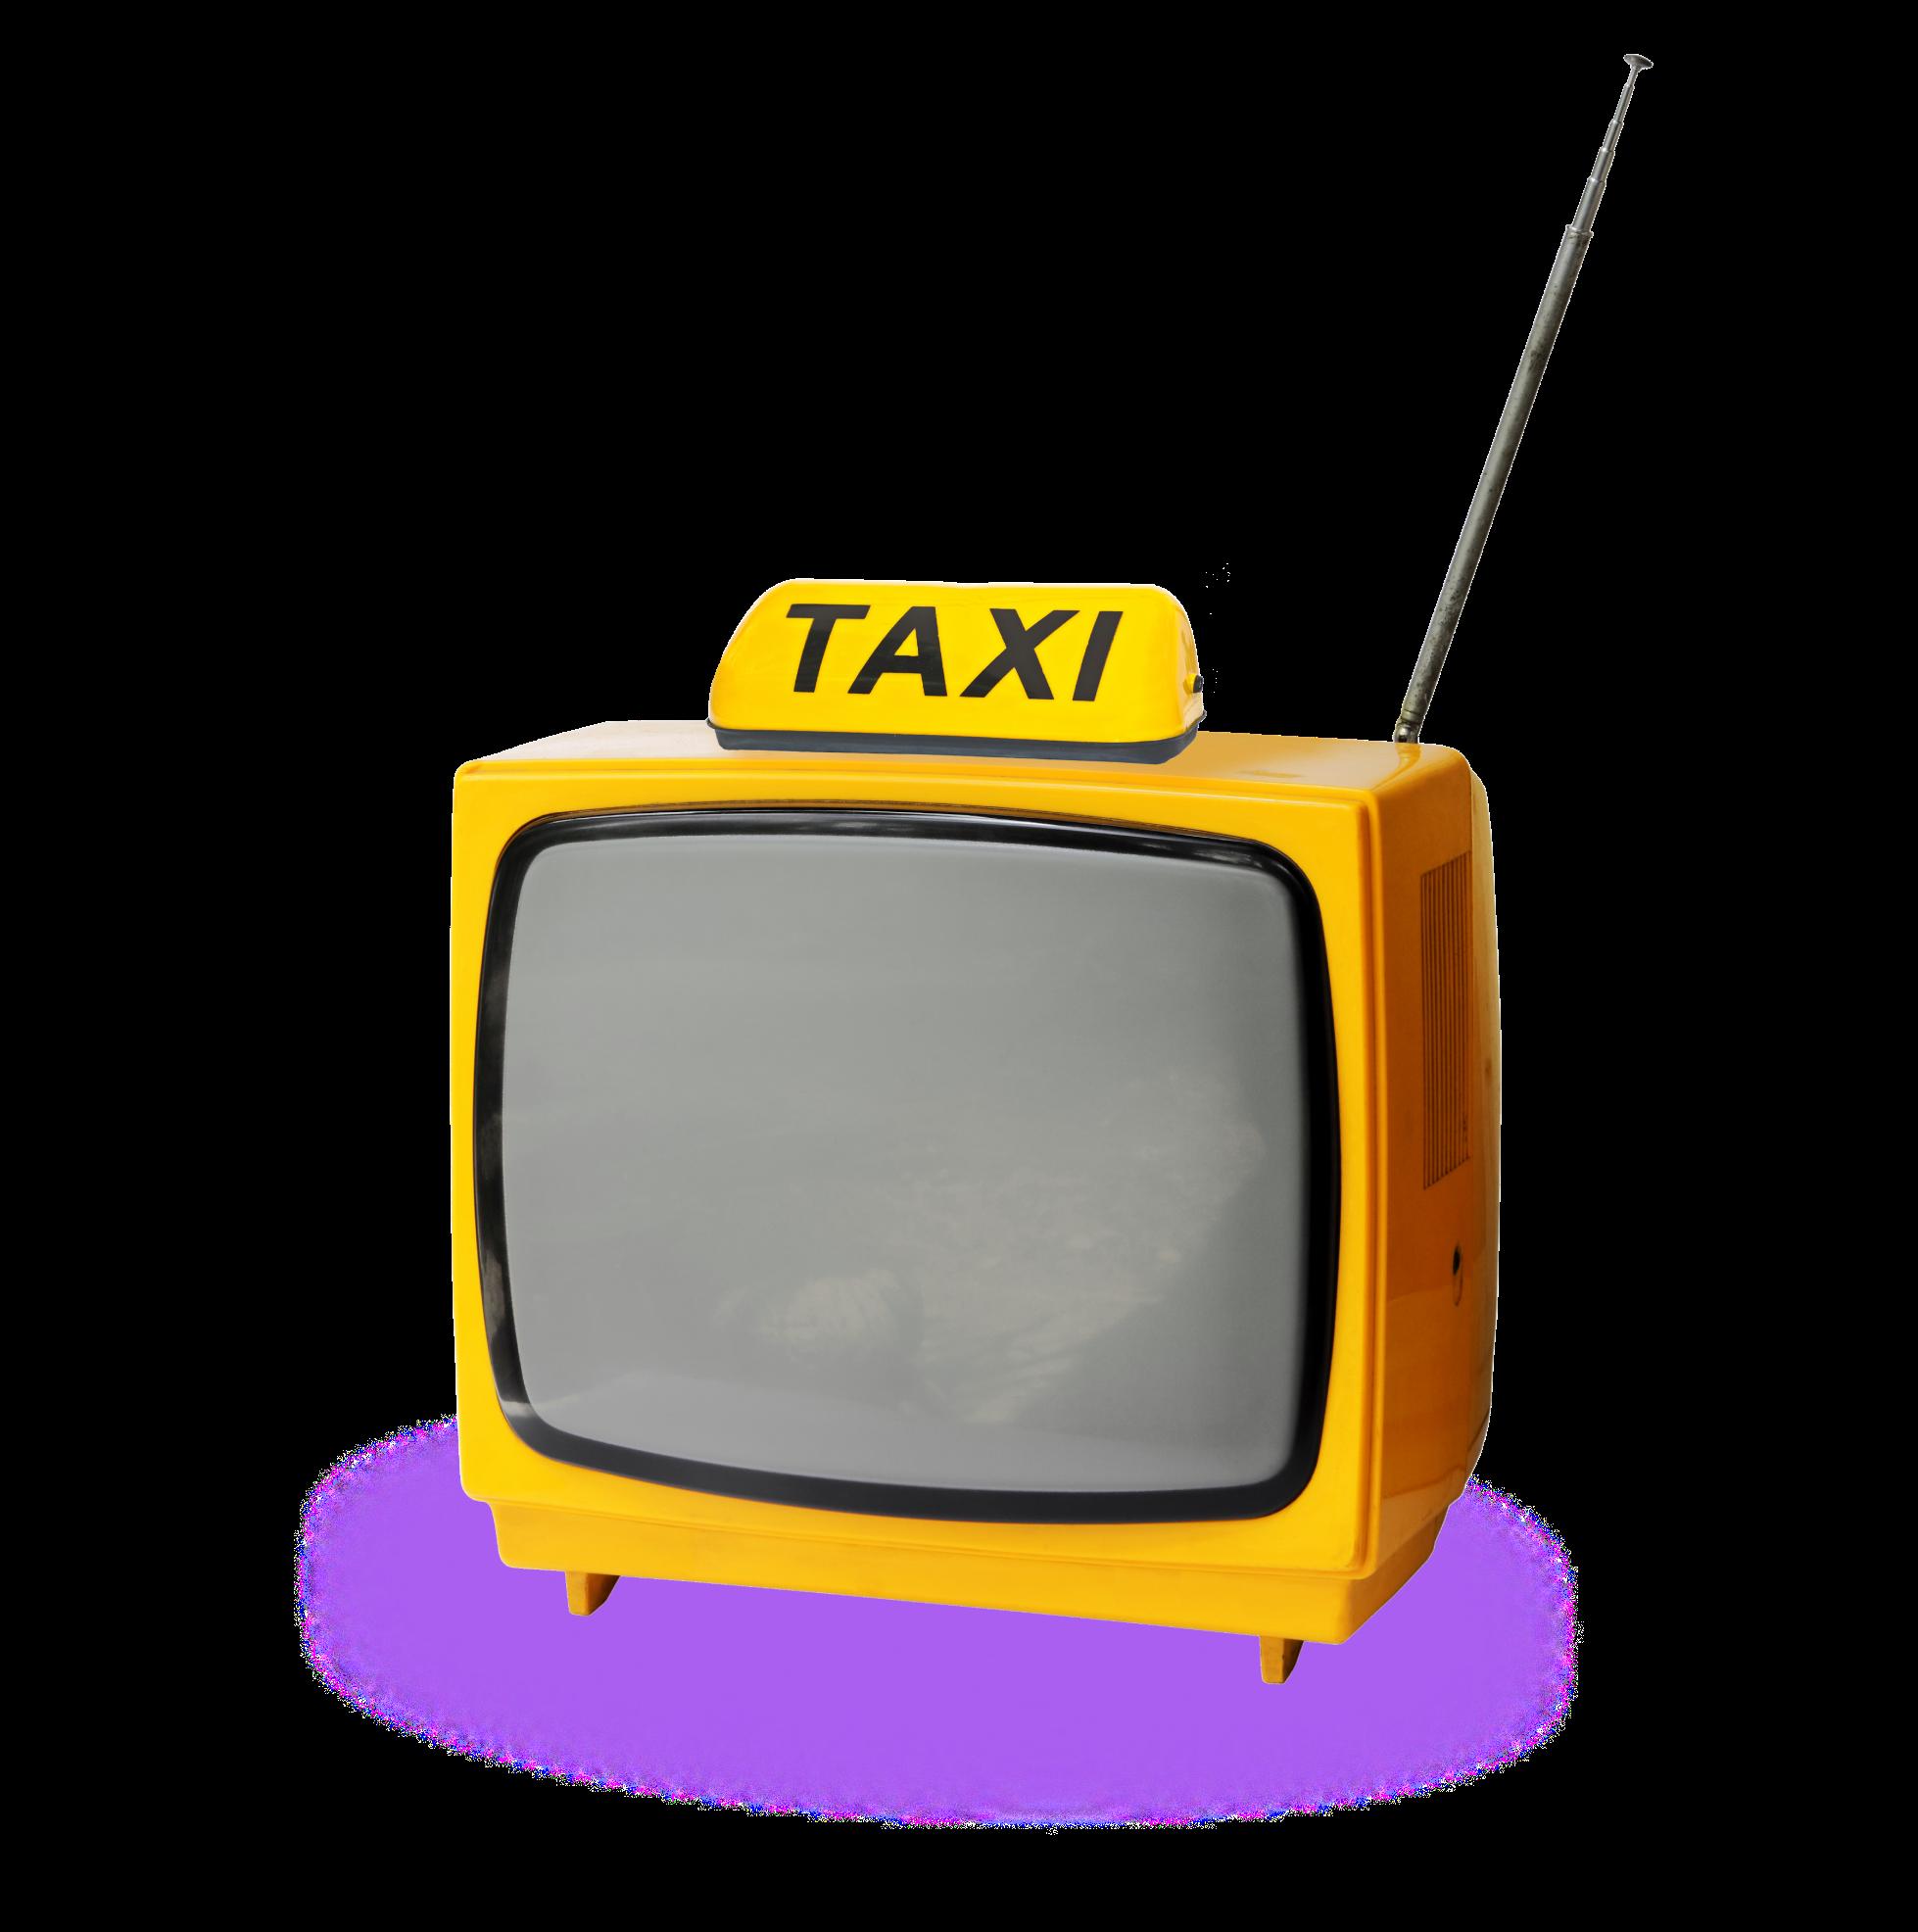 «Сейчас система работает как флешка». Что таксопарки думают про КИС «АРТ»?